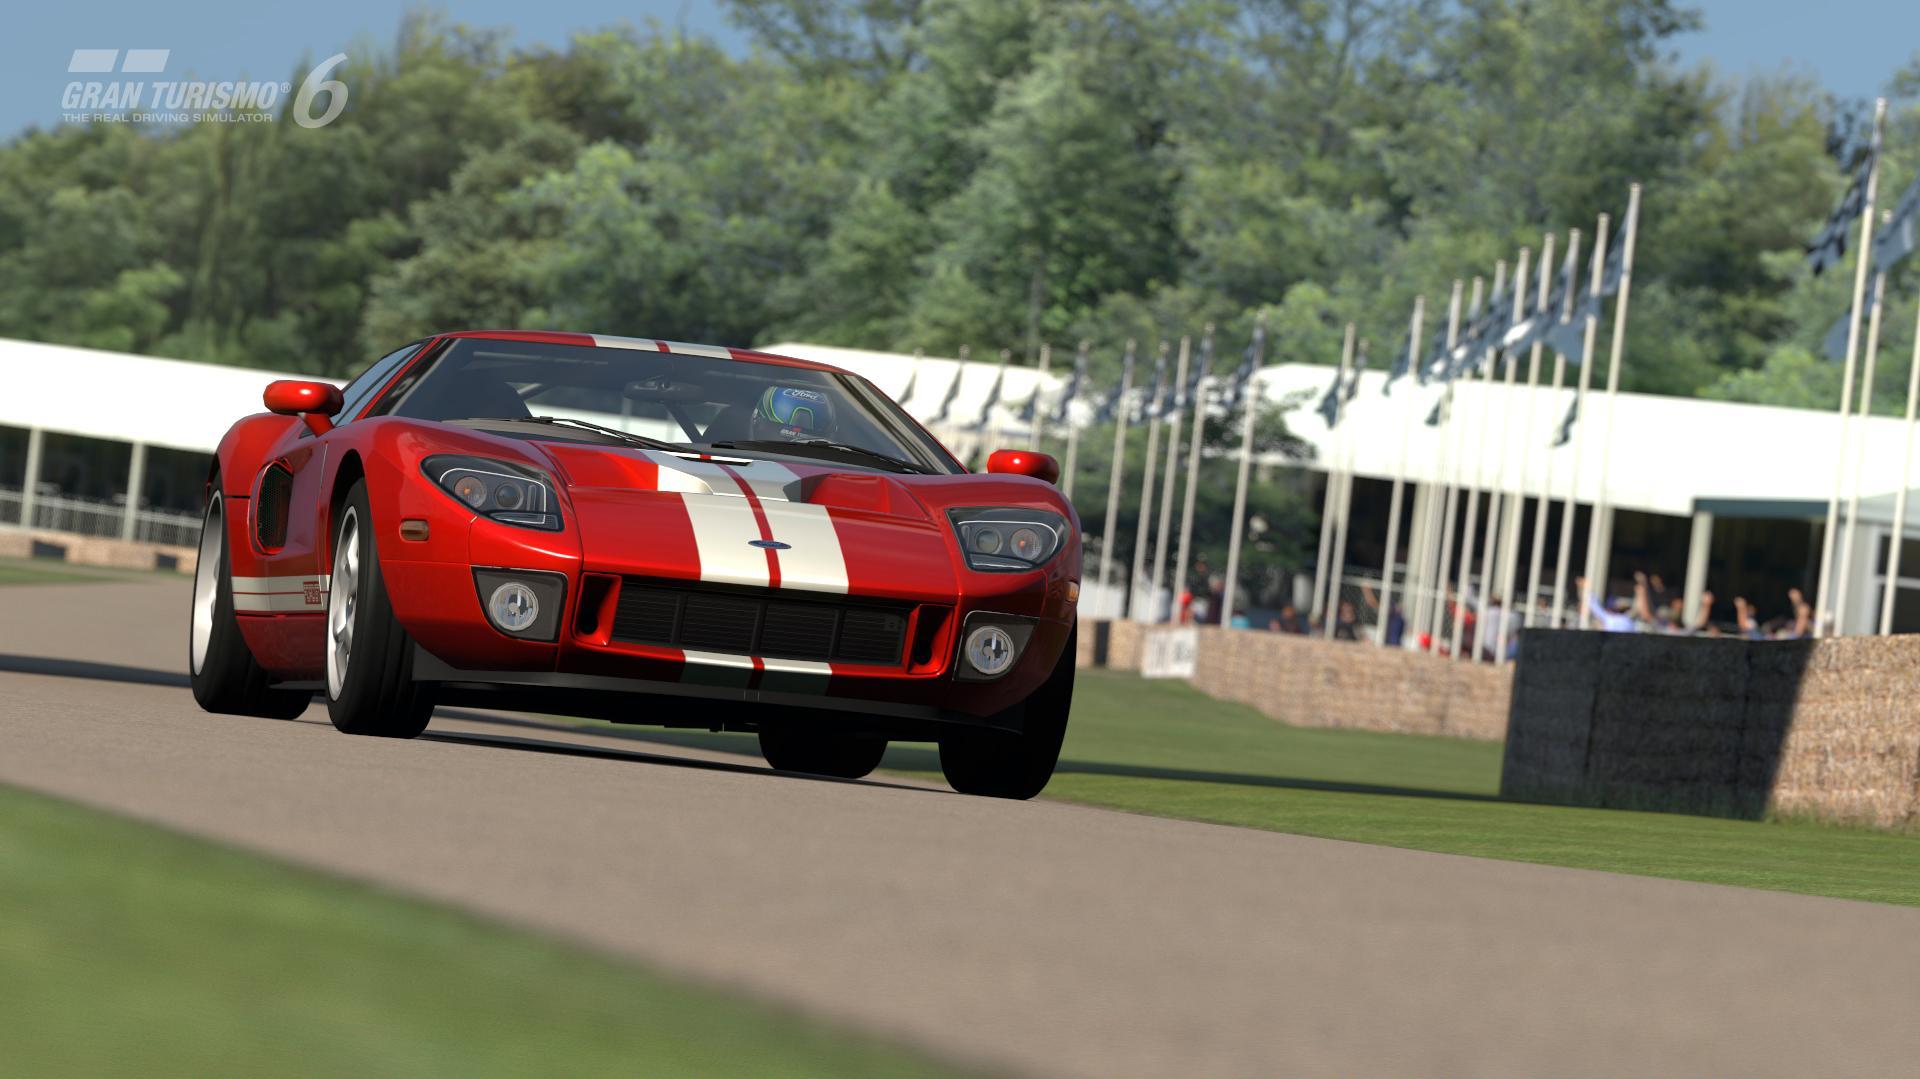 Gamescom Gran Turismo 6 Gameplay Trailer